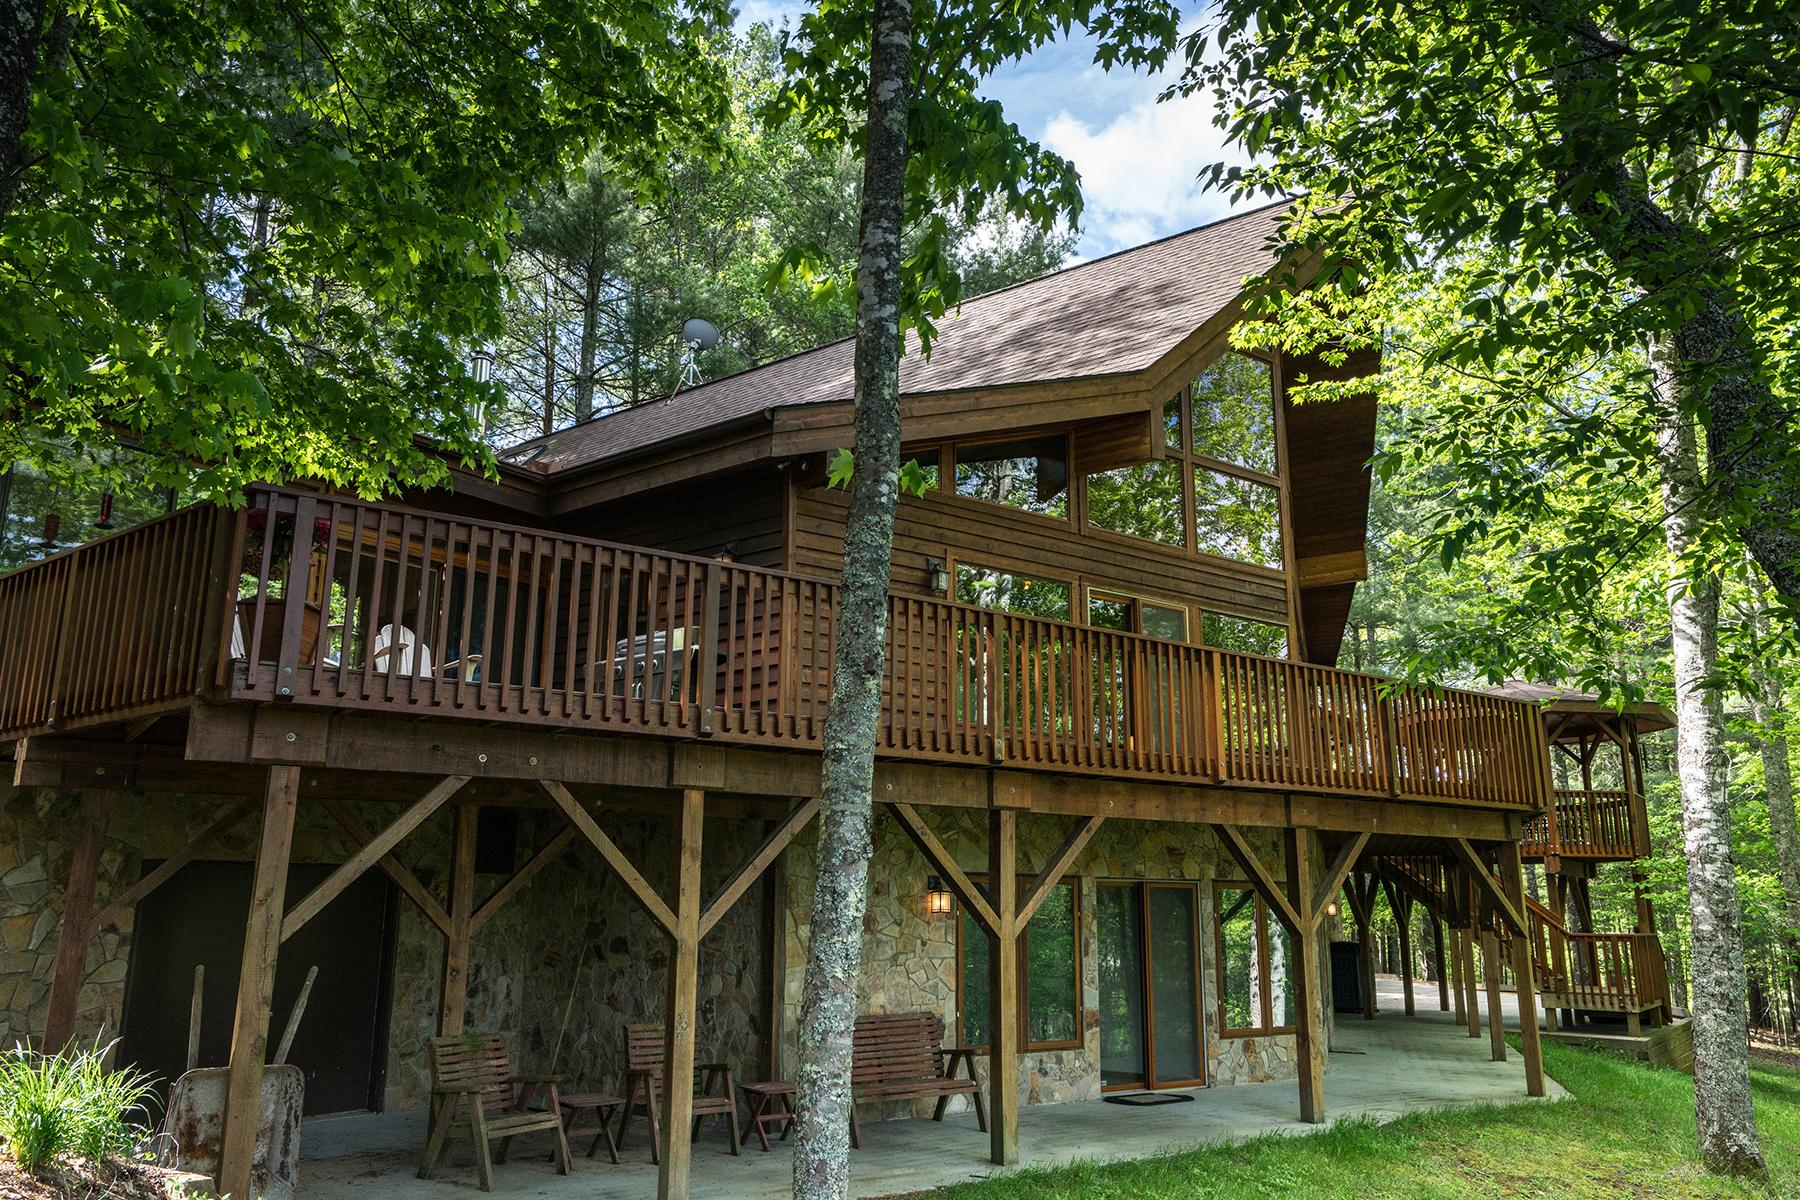 Villa per Vendita alle ore CRUMPLER - THE RIDGE AT CHESTNUT HILL 154-158 Sessums Lane Crumpler, Carolina Del Nord, 28617 Stati Uniti